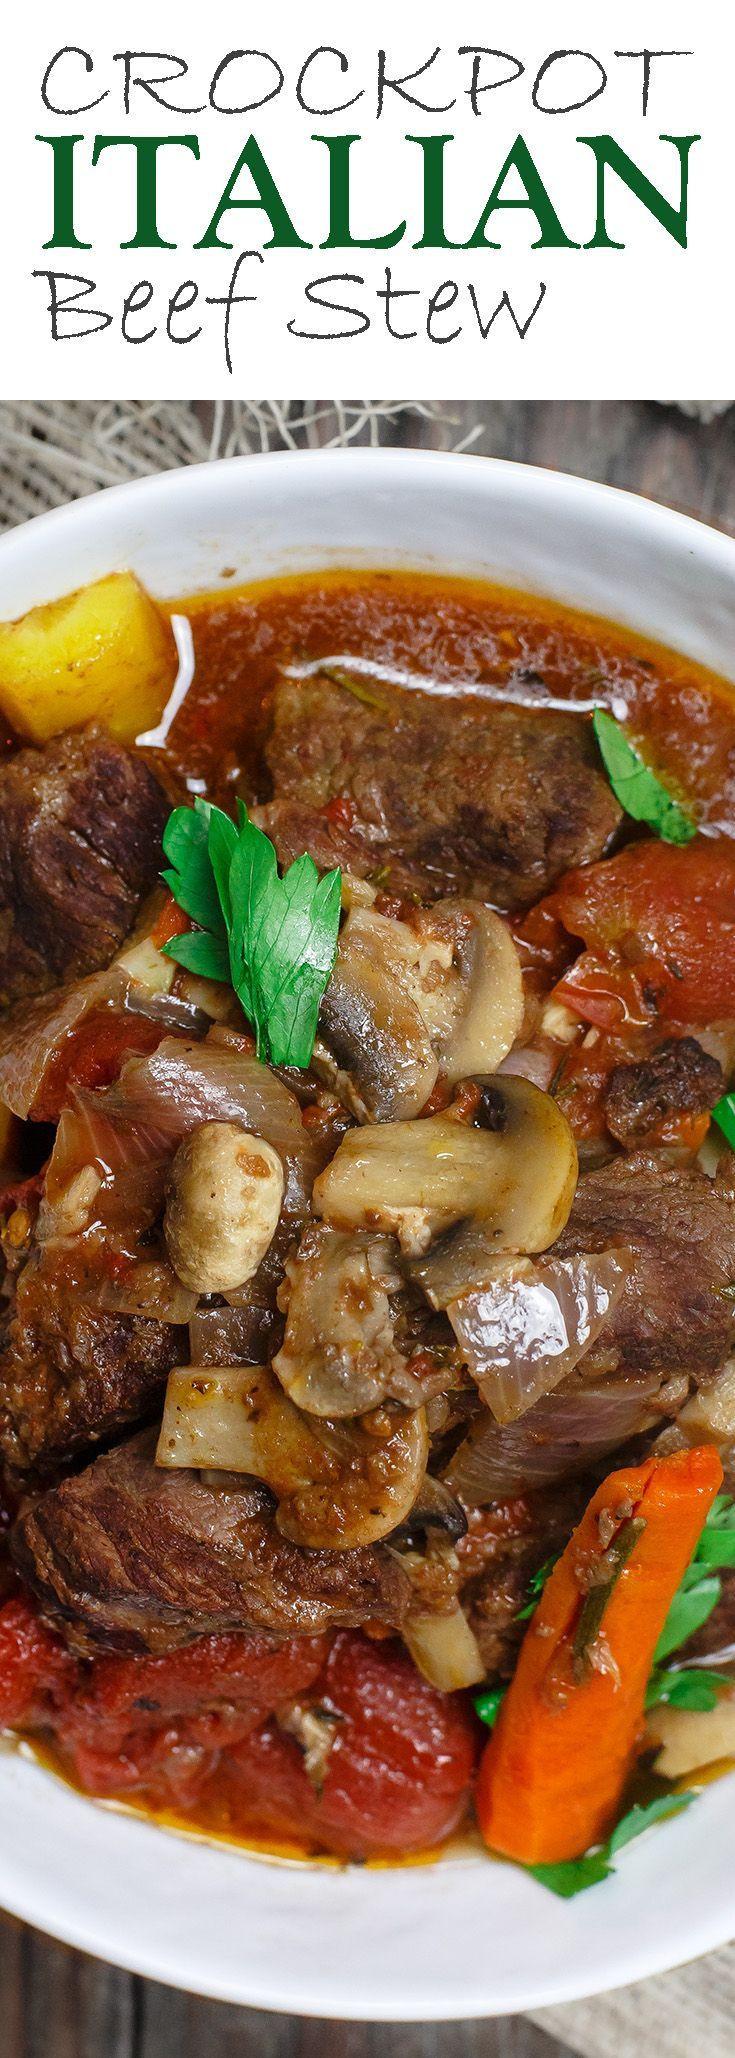 Stew Meat Recipes Crock Pot Keto  Crock Pot Italian Beef Stew Recipe